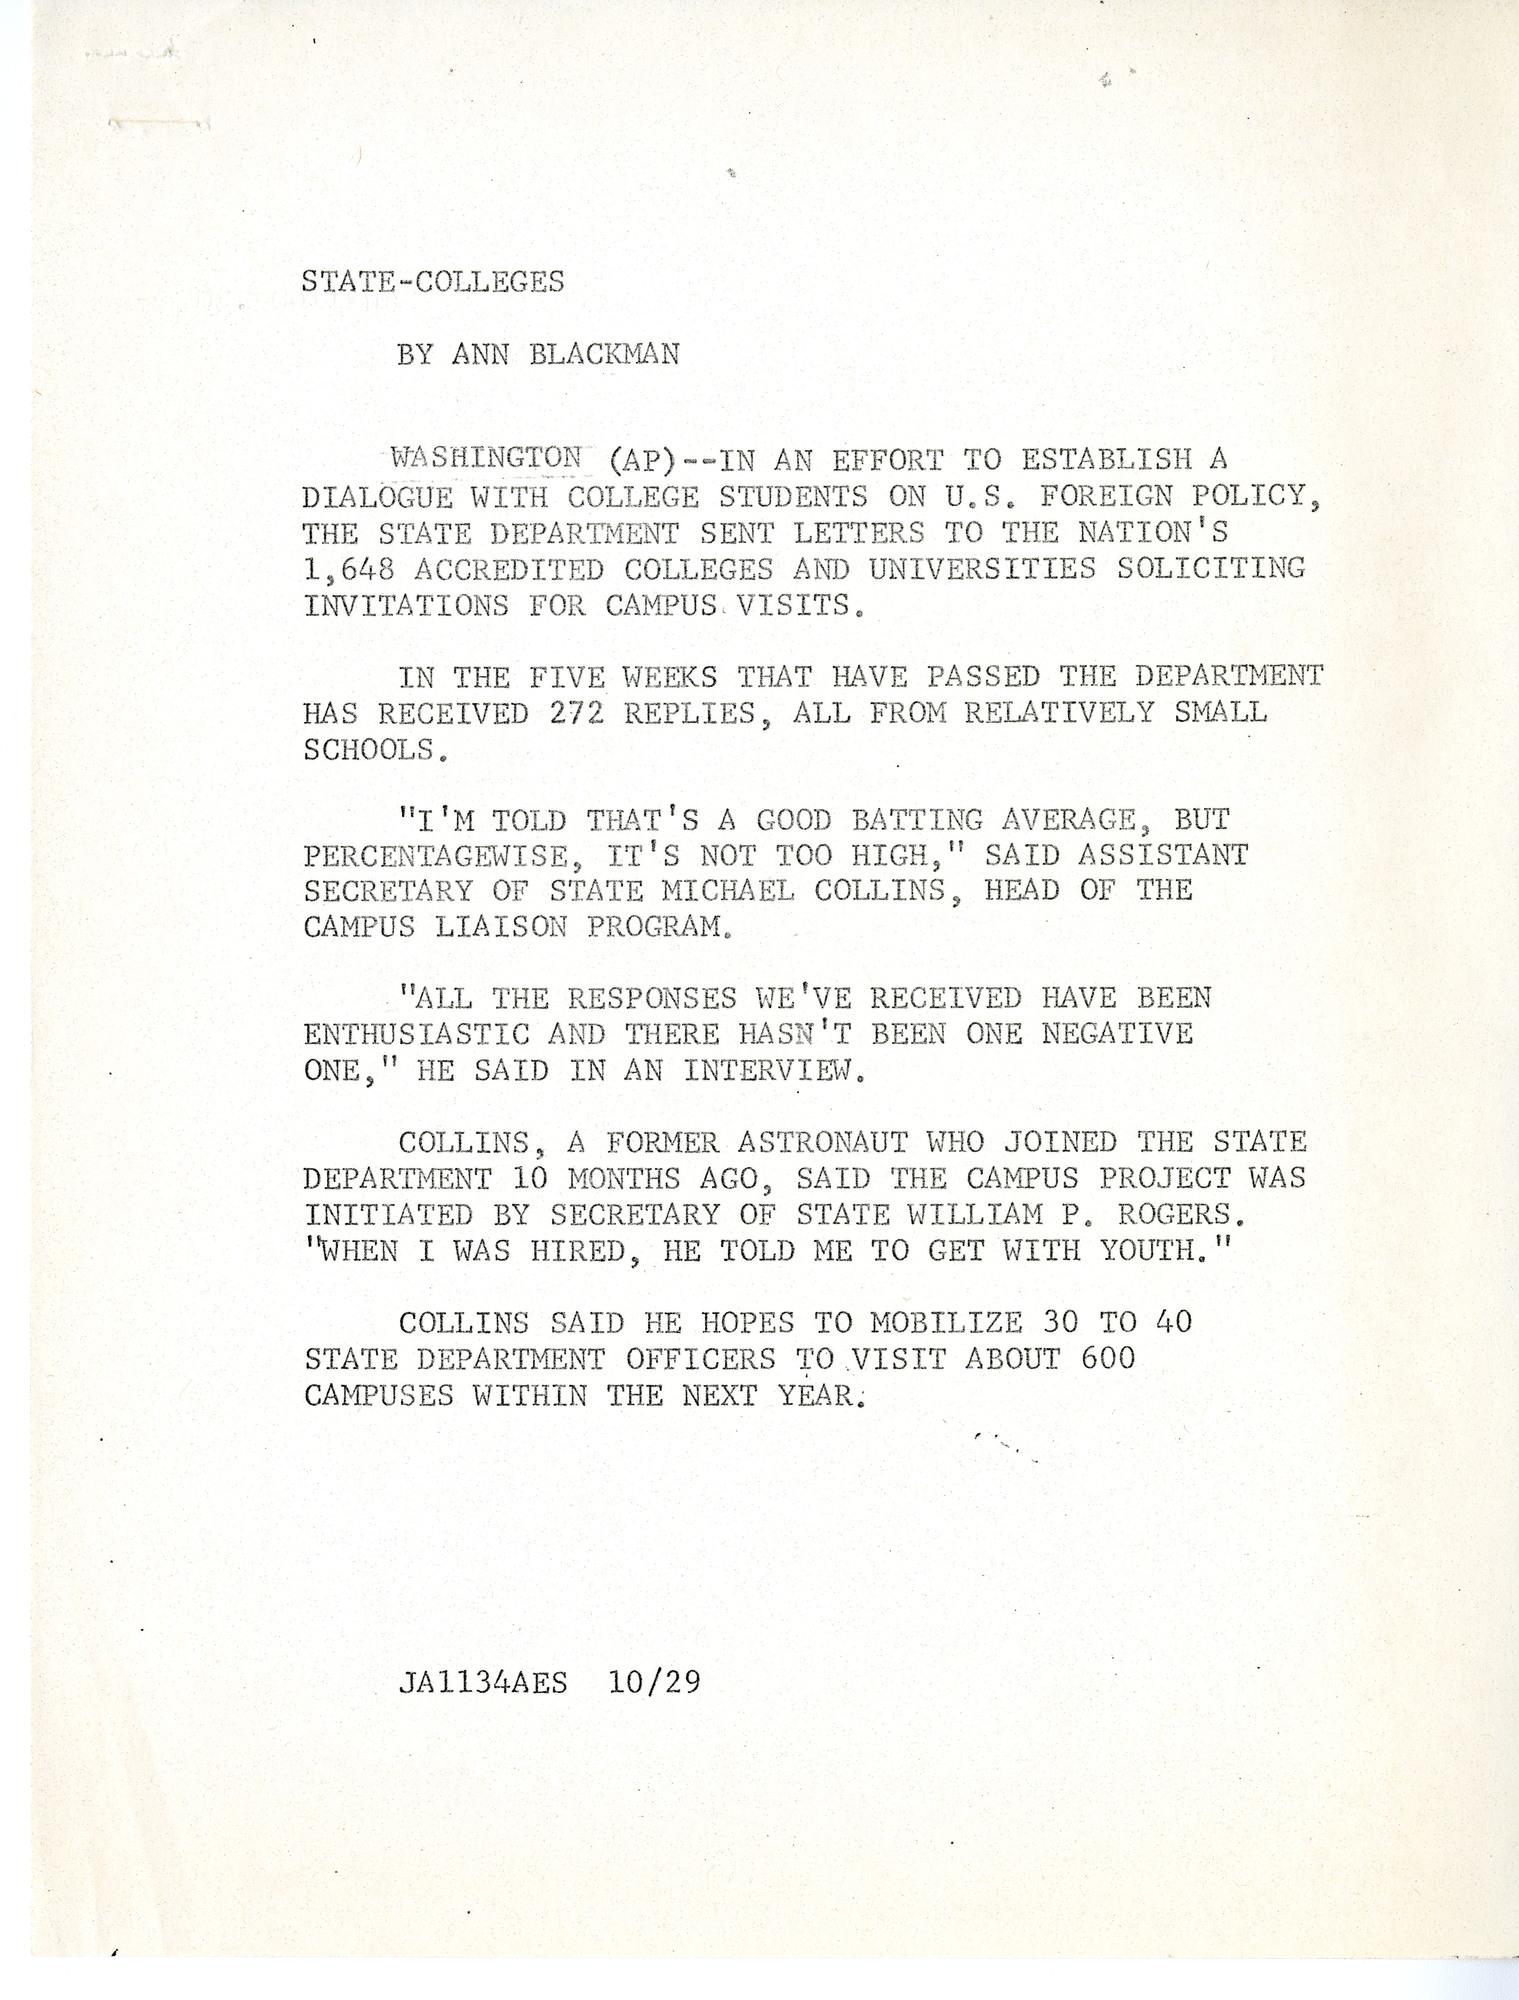 http://spec.lib.vt.edu/pickup/Omeka_upload/Ms1989-029_B18_F1_MichaelCollins_Article_1970_1029.jpg